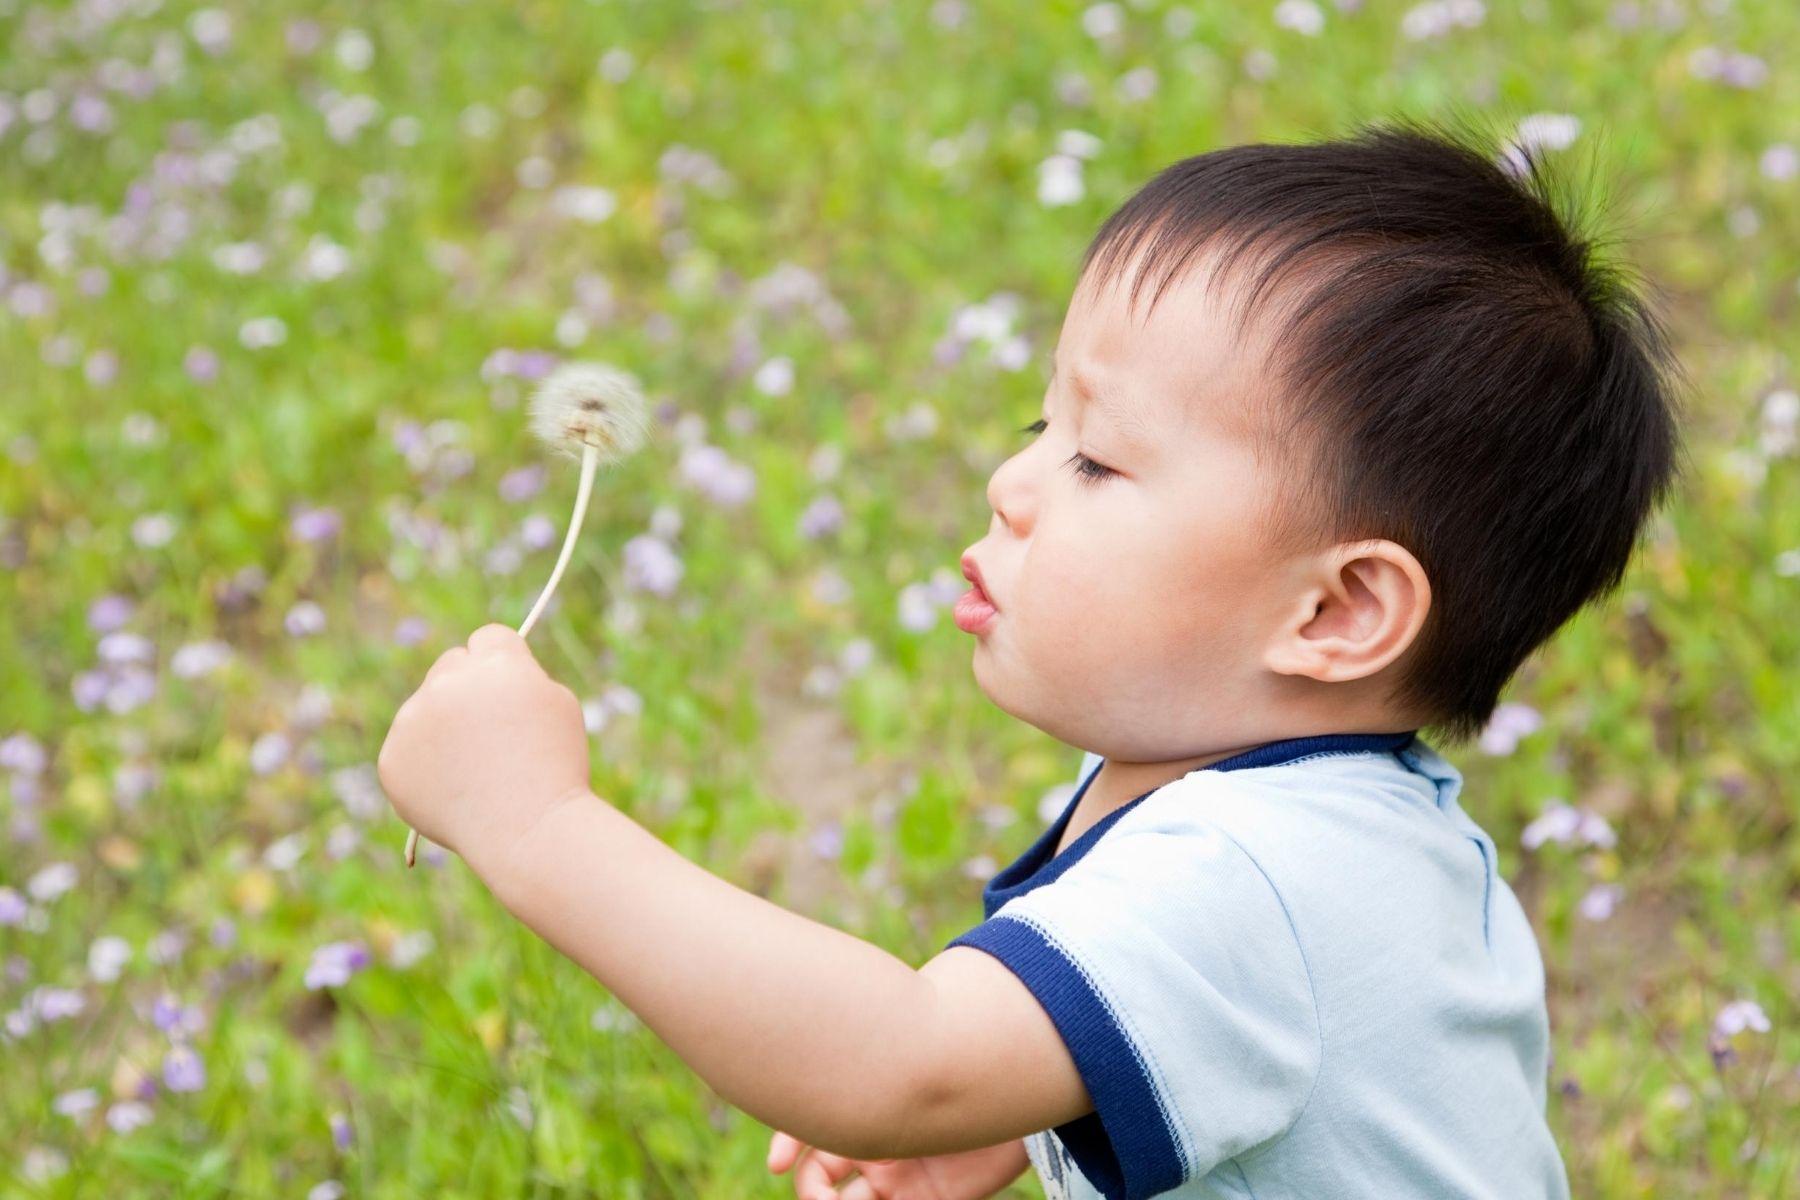 Pesticide_Kid_Dandelion_Source: Canva